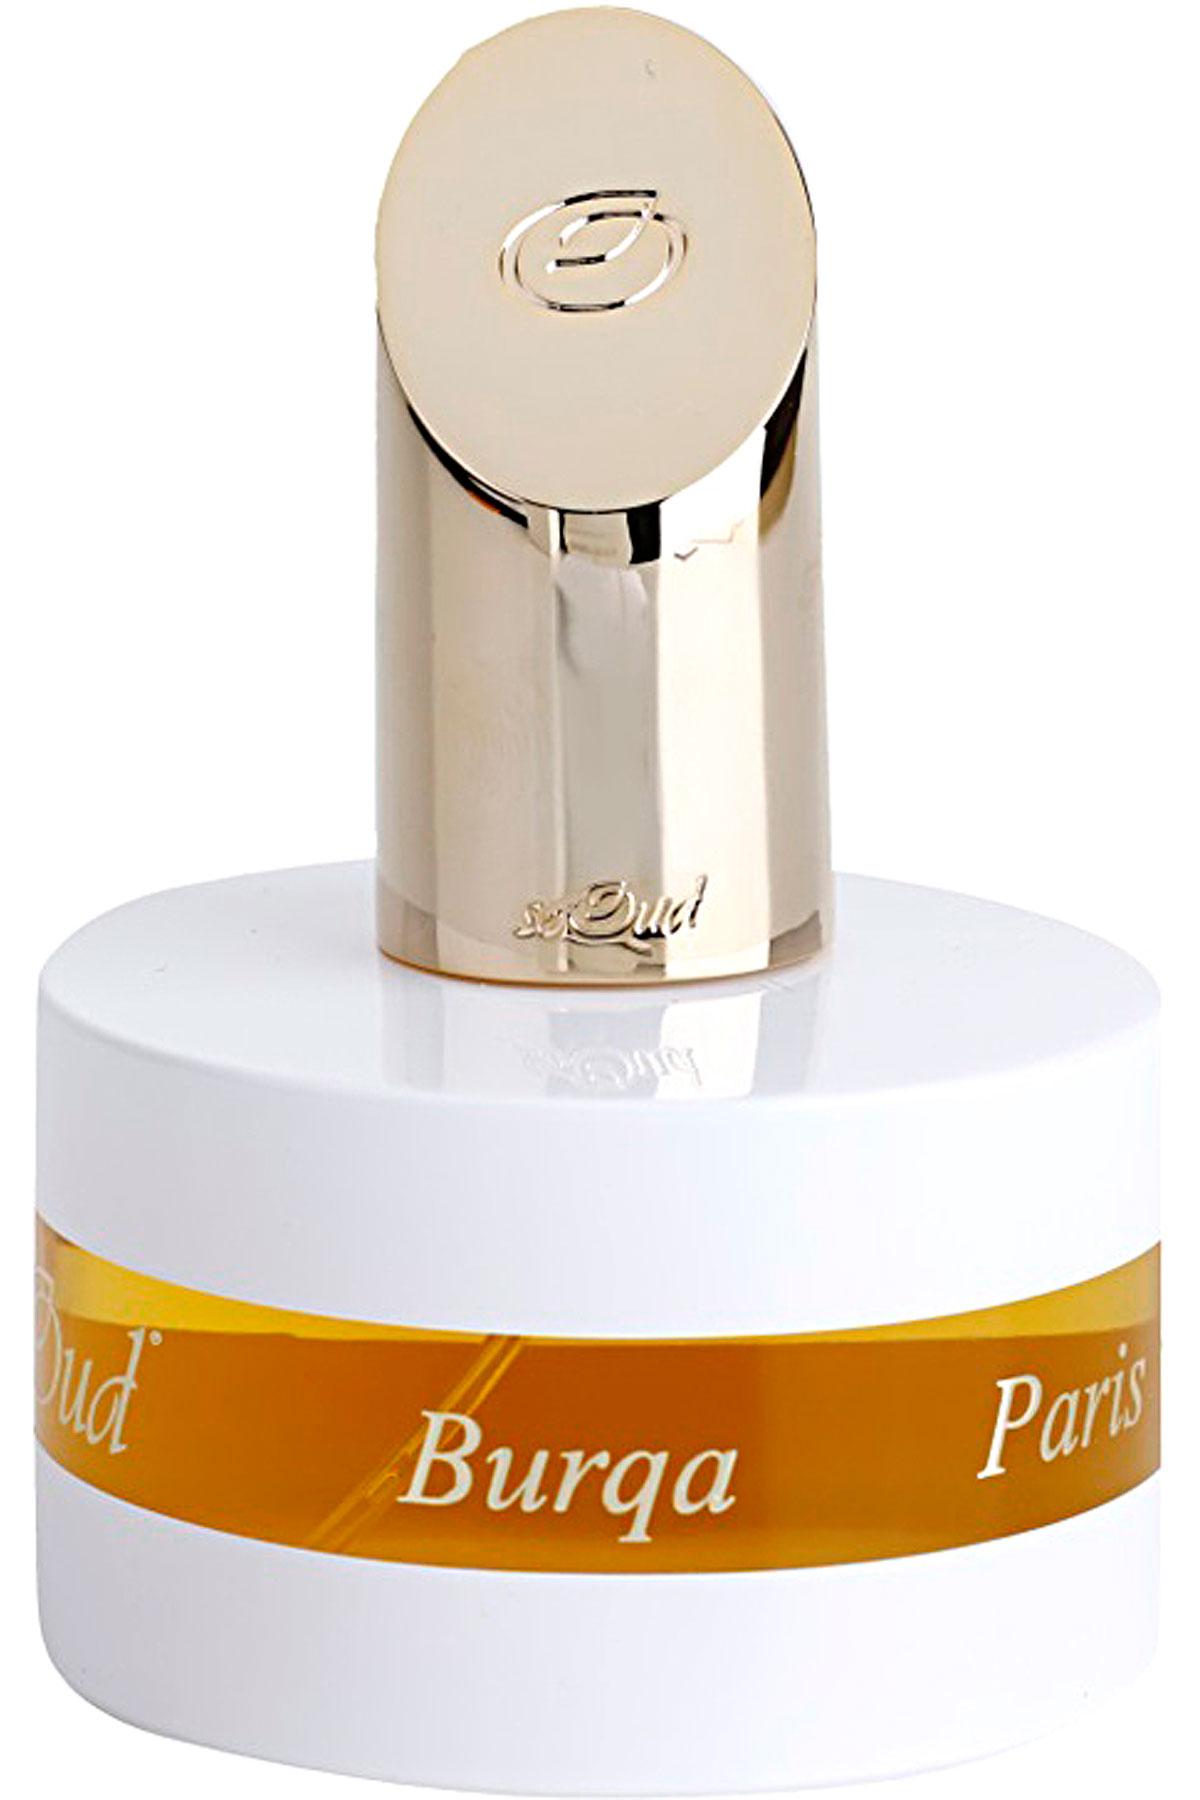 SoOud Fragrances for Women, Burqa - Eau Fine - 60 Ml, 2019, 60 ml